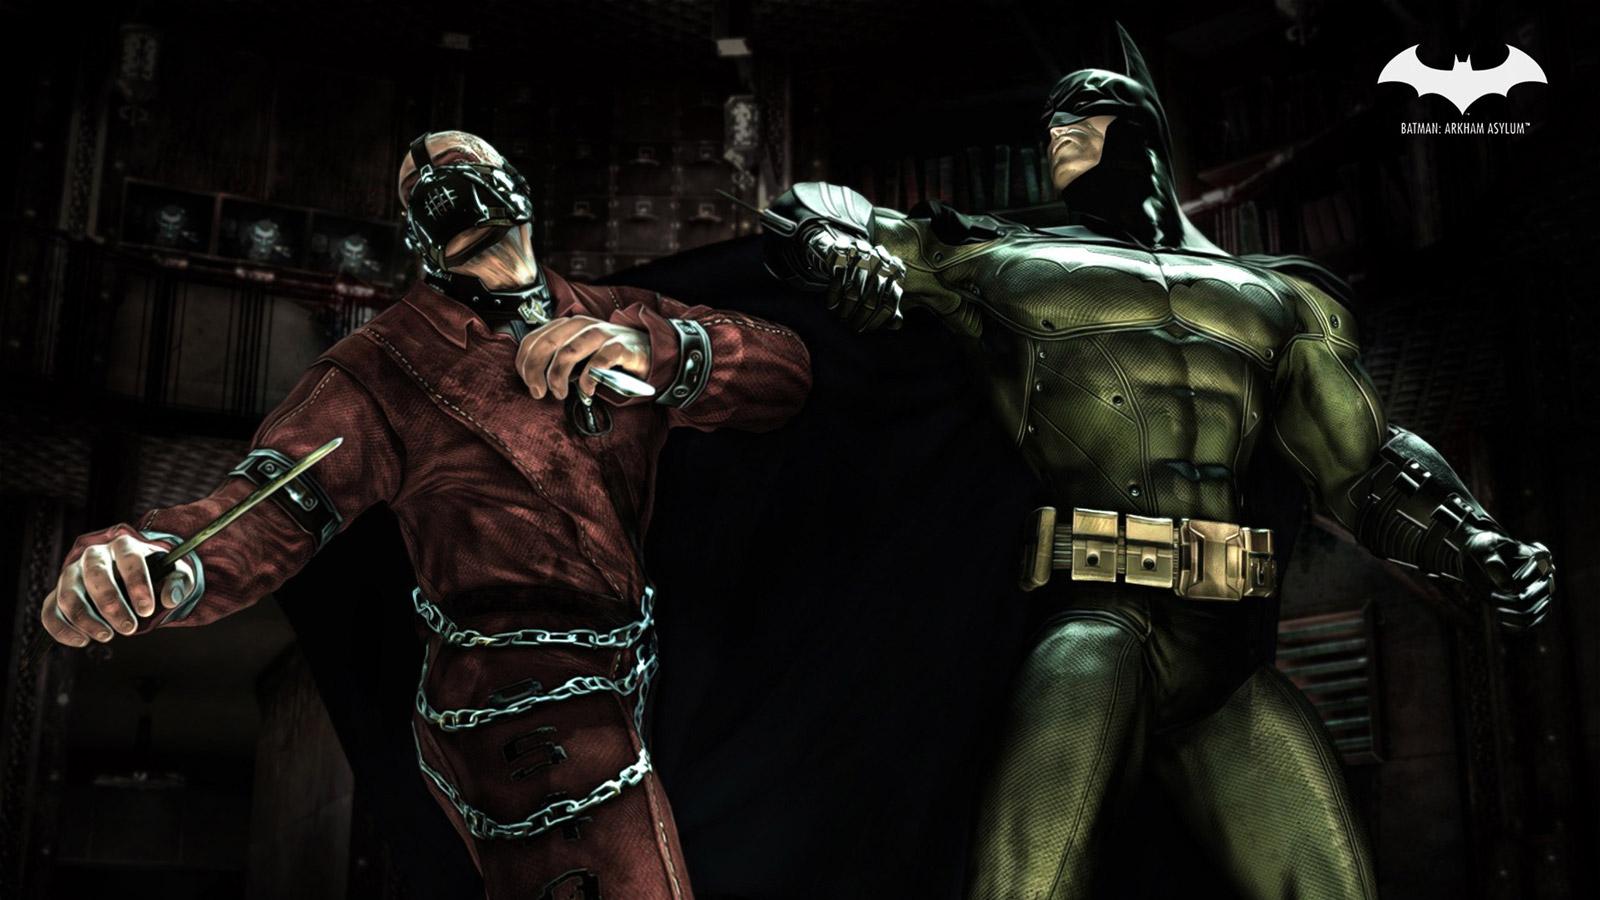 Batman: Arkham Asylum Wallpaper in 1600x900